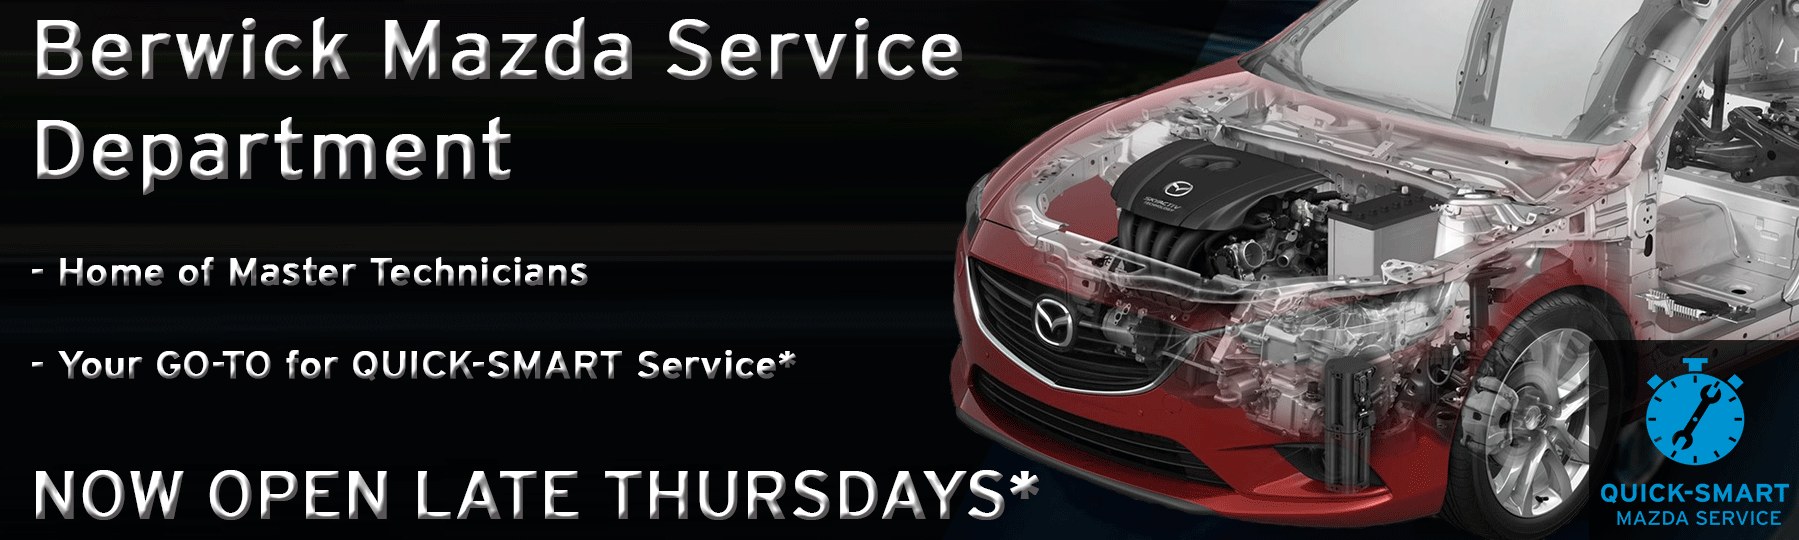 Berwick Mazda: Thursday late night Servicing